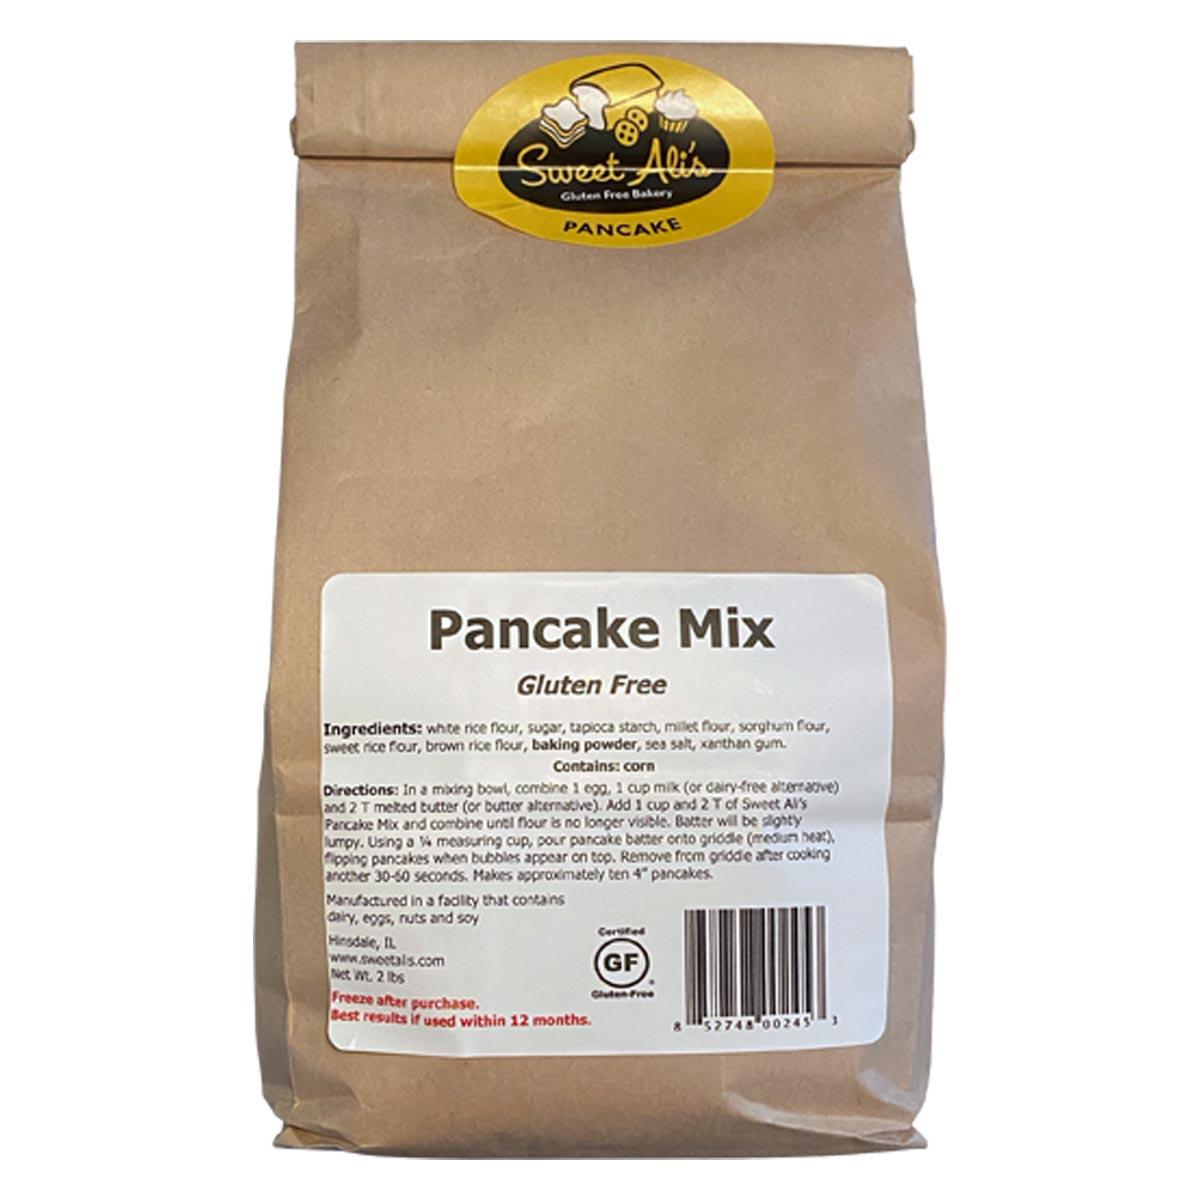 Pancake Mix Packaged Square